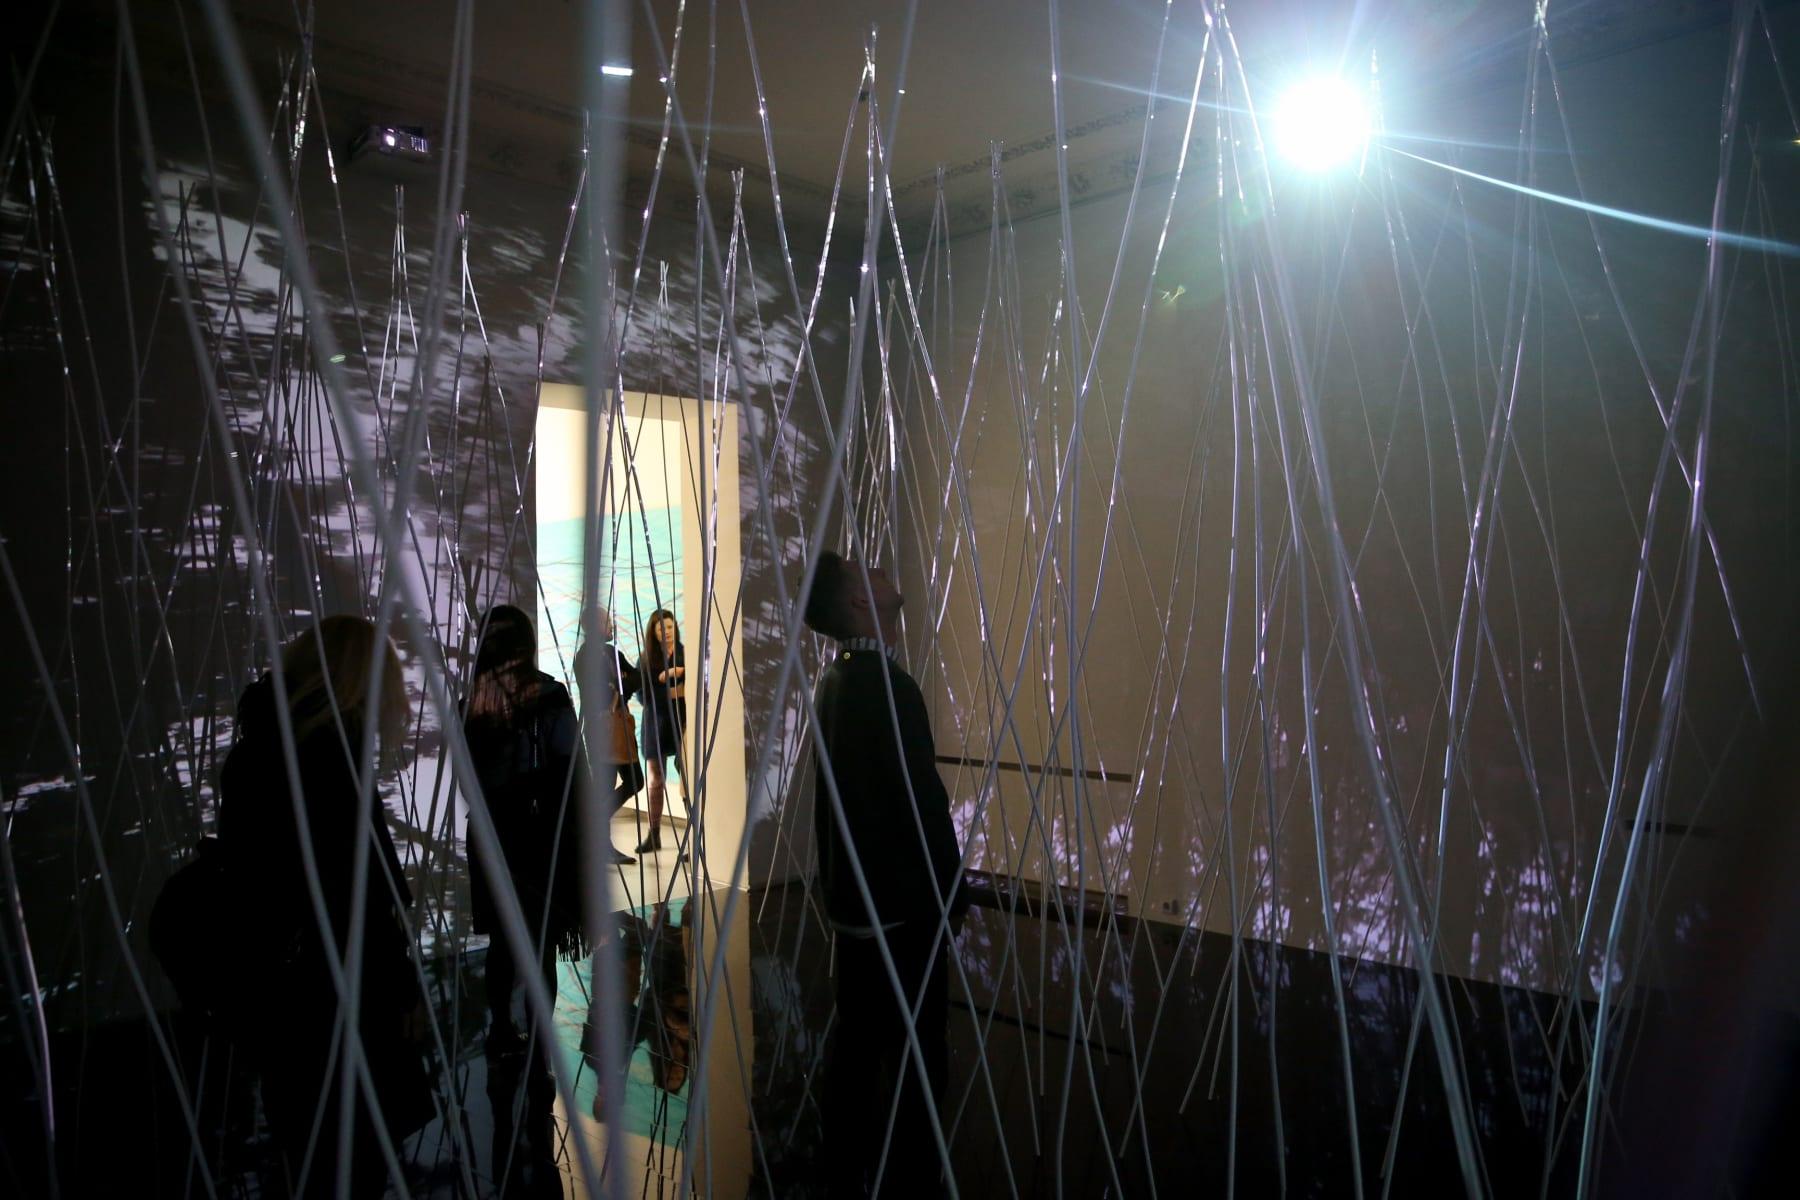 Galerija VARTAI, 2011 Žilvinas Kempinas's solo exhibition